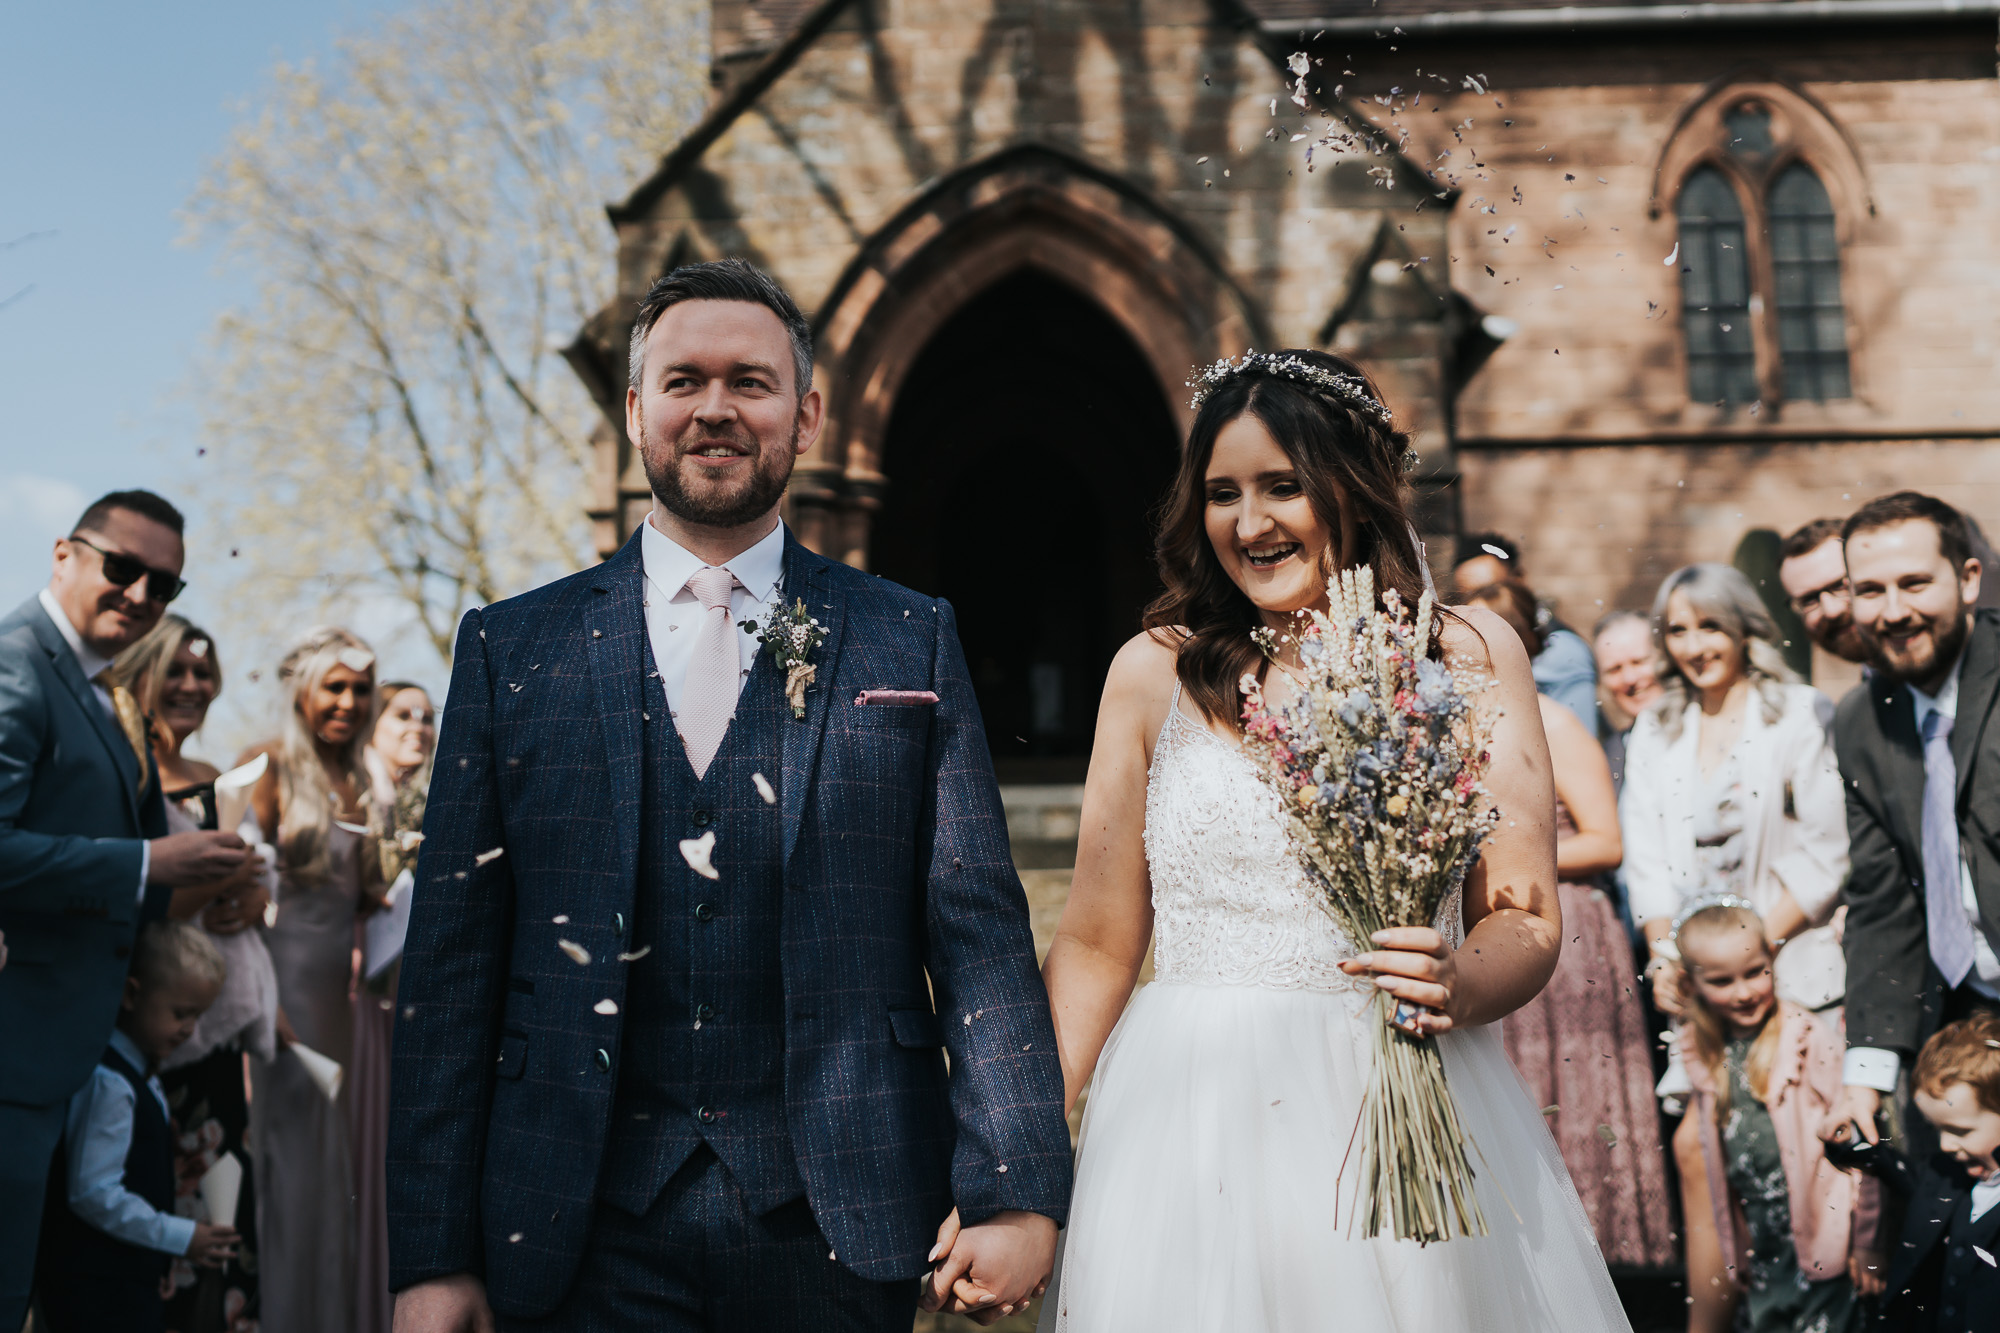 farm wedding in cheshire wedding photographer based in liverpool  (13 of 36).jpg